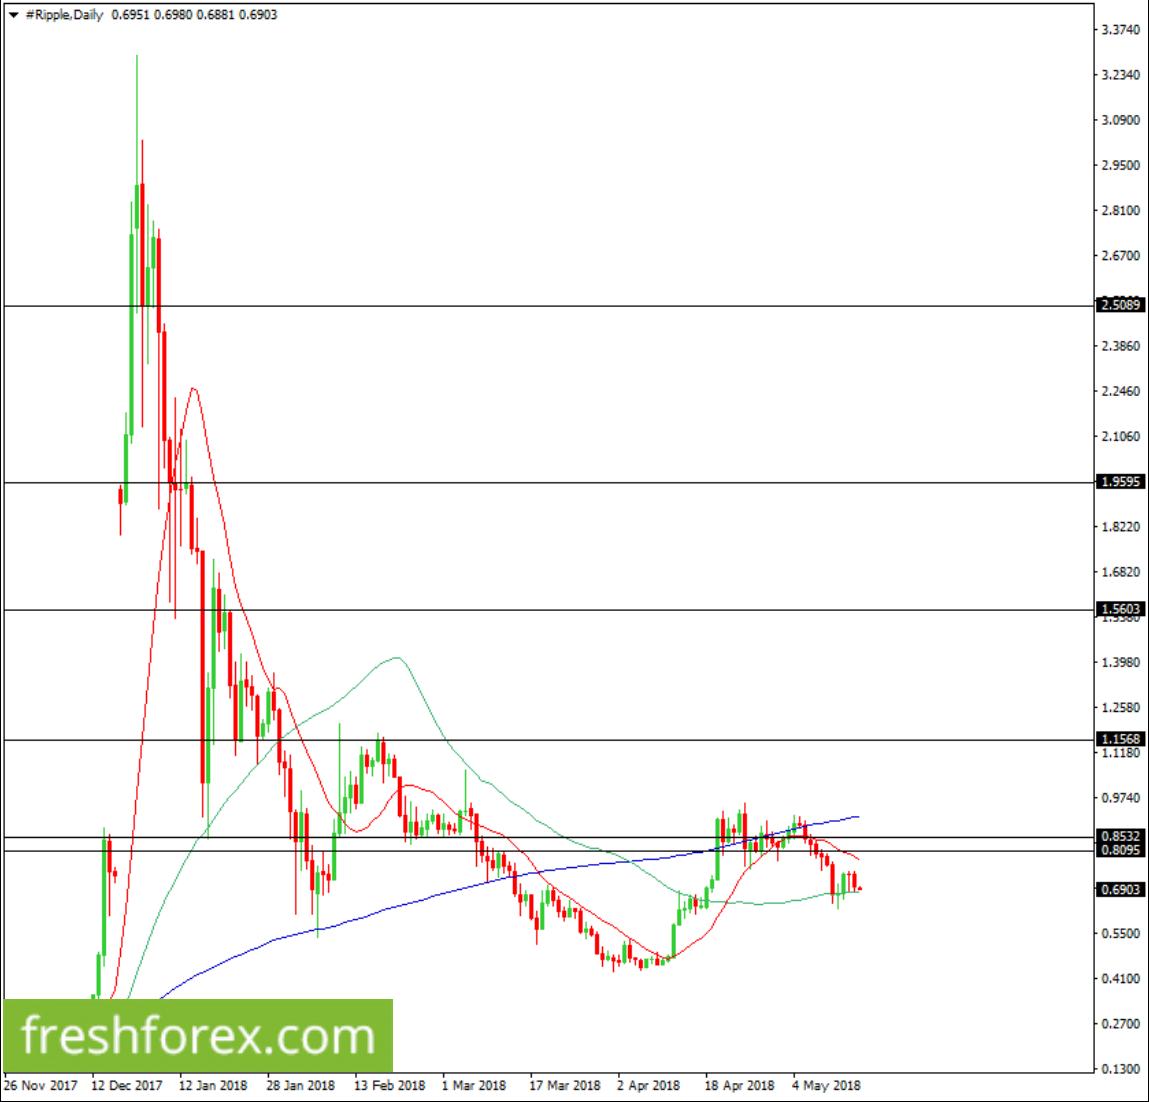 Buy XRP now towards $0.8095